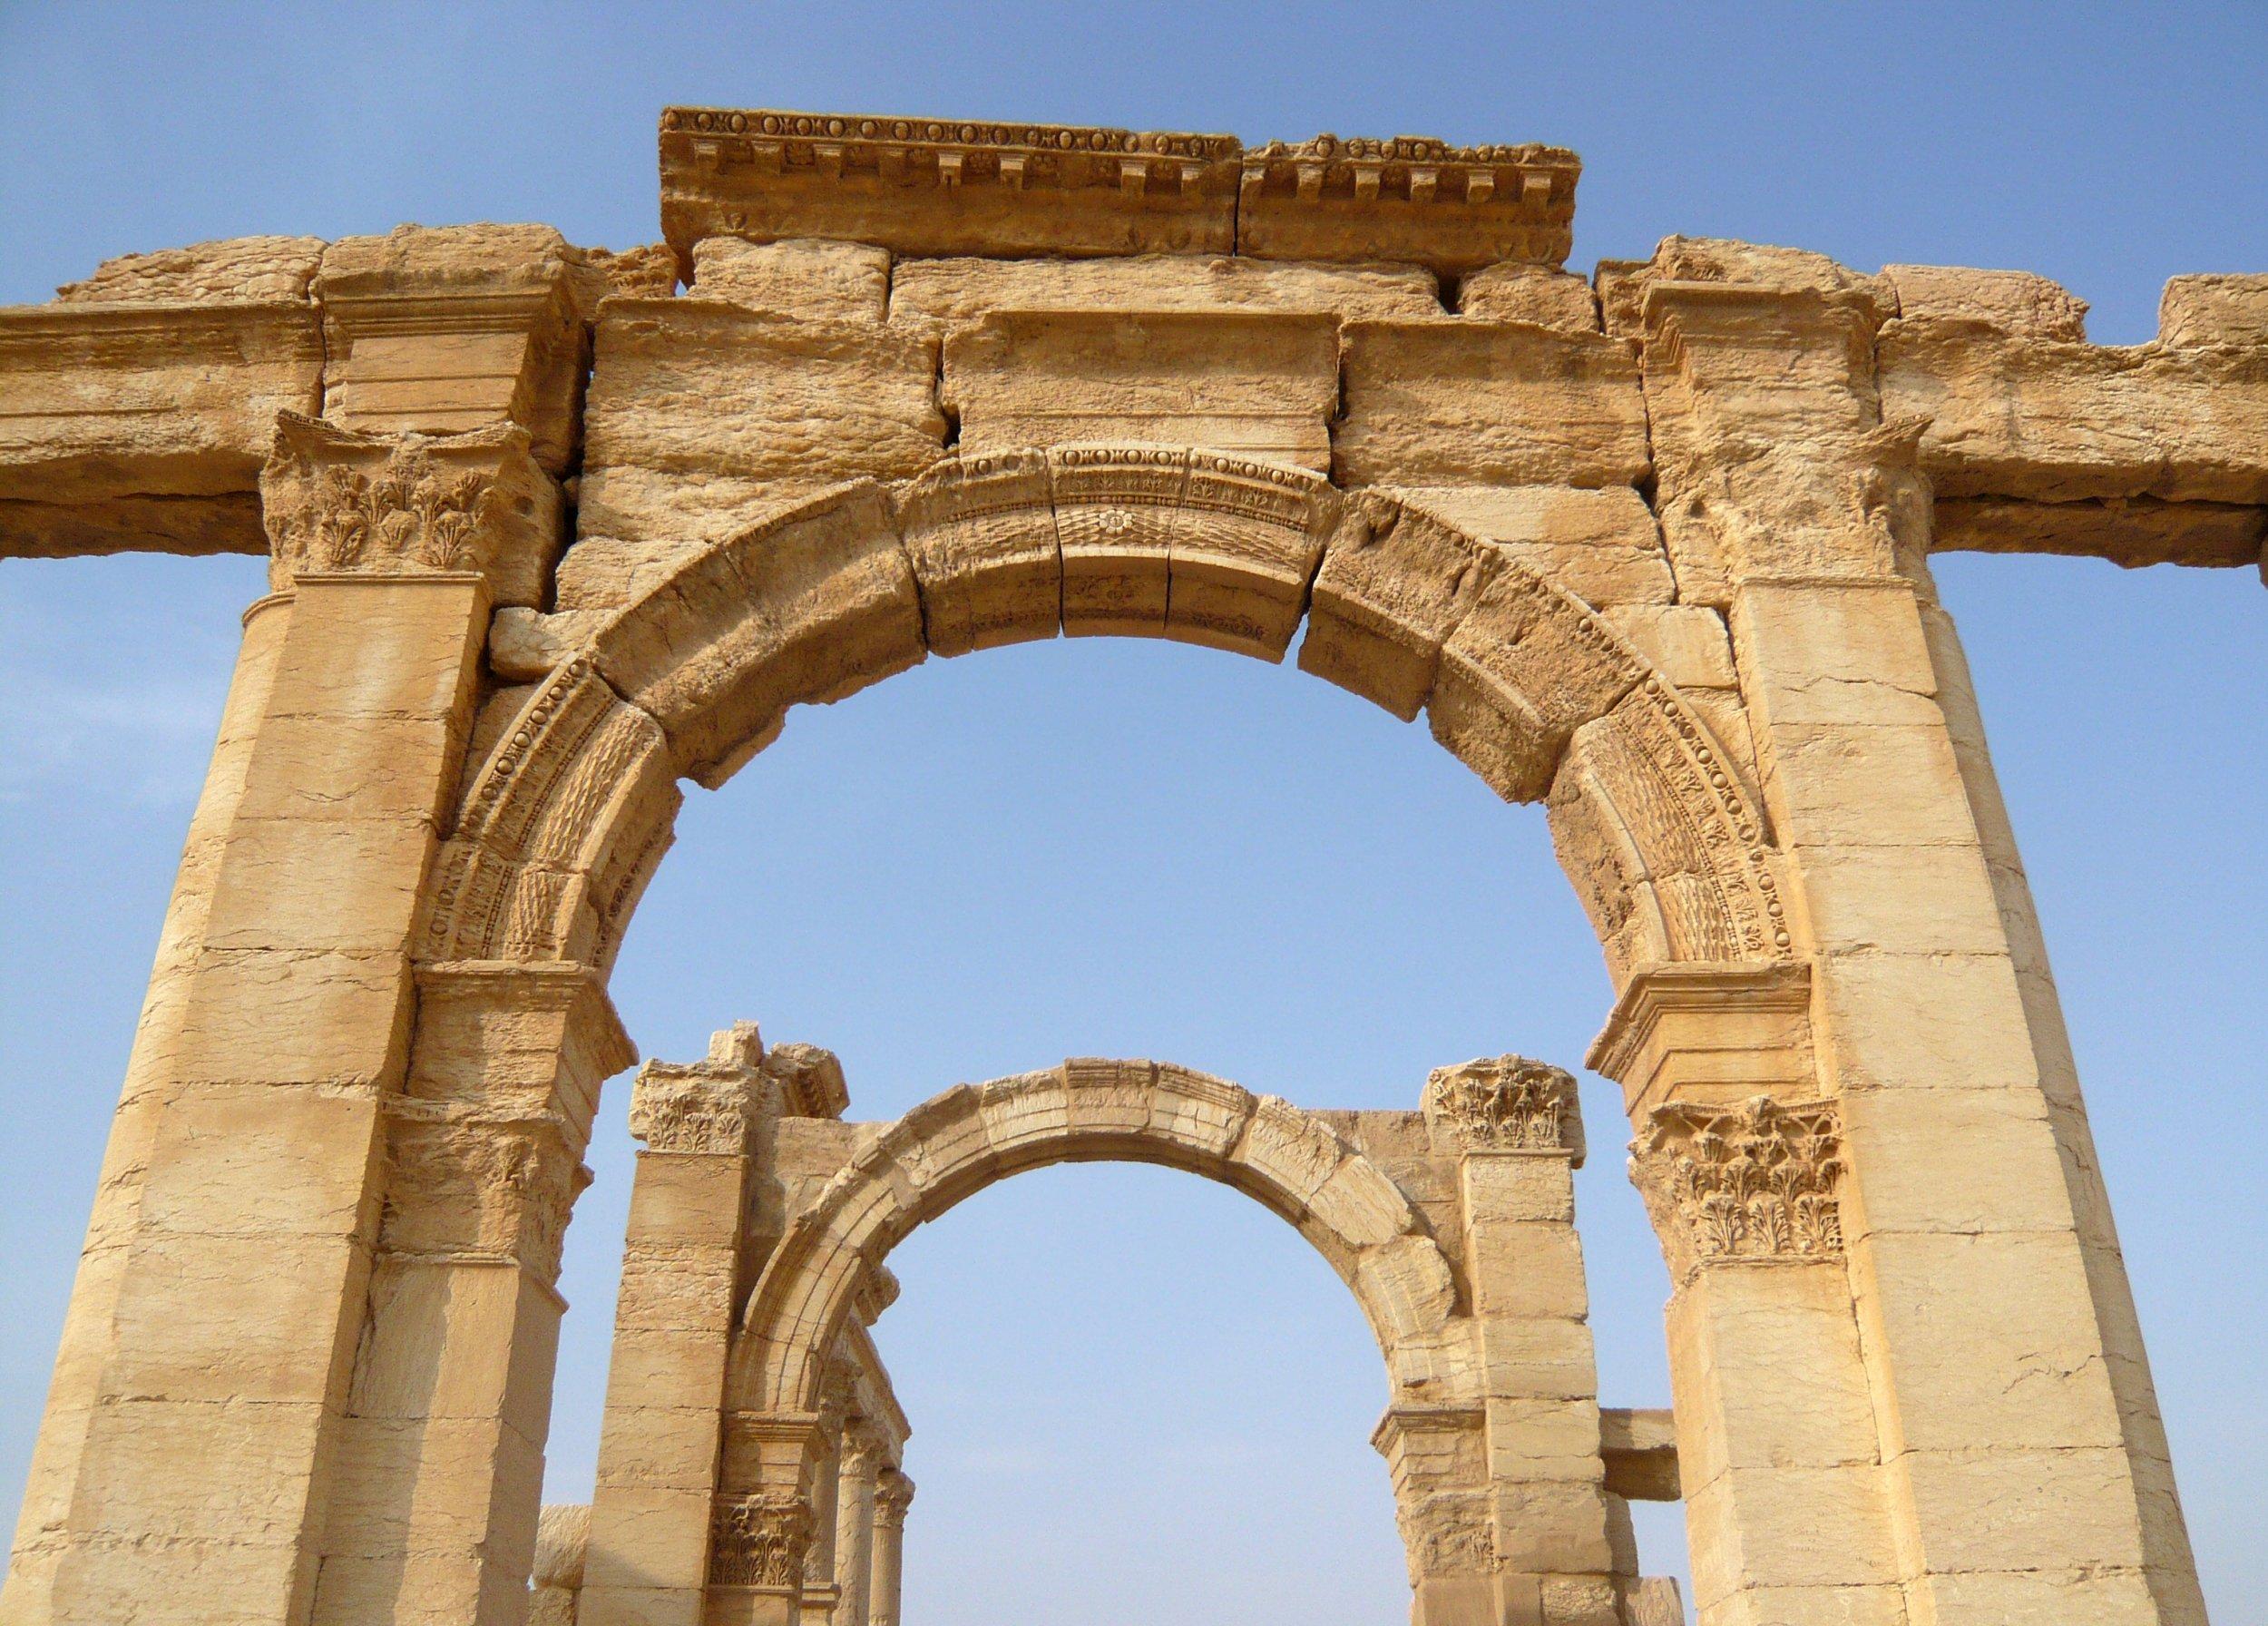 Arch in Palmyra